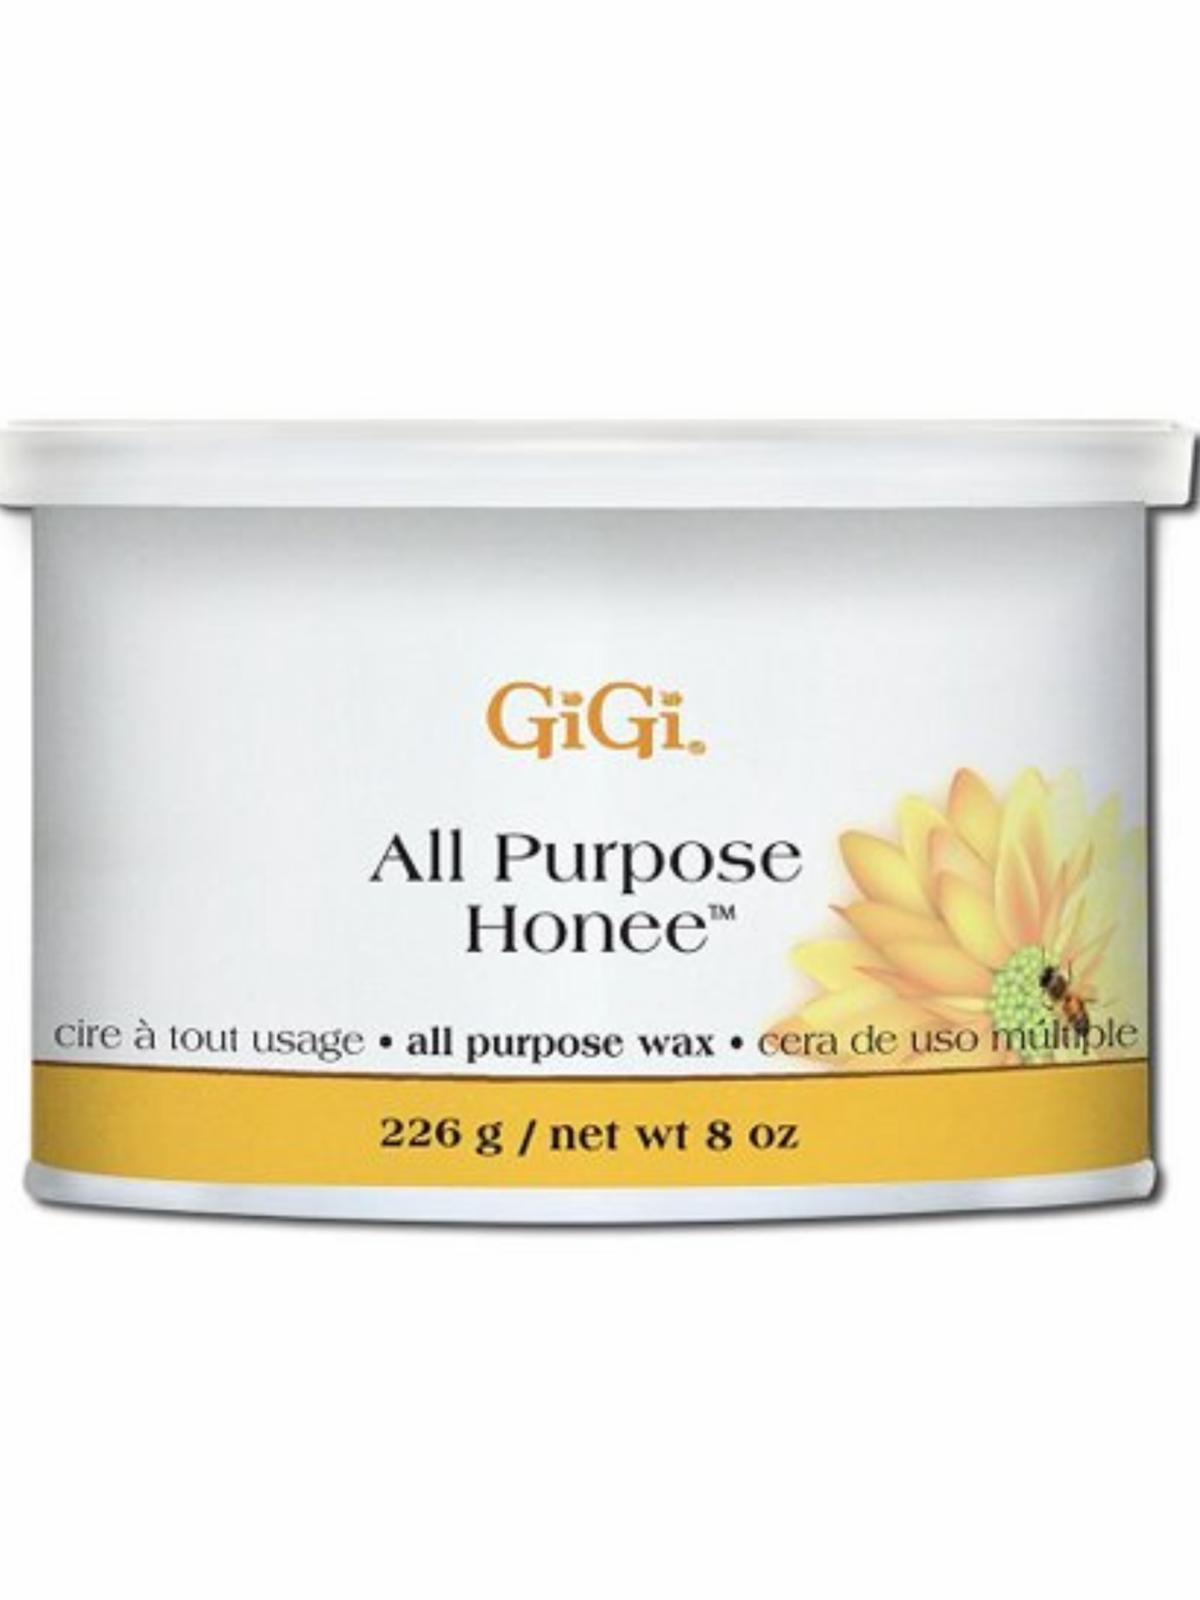 all purpose honee wax hair remover 8